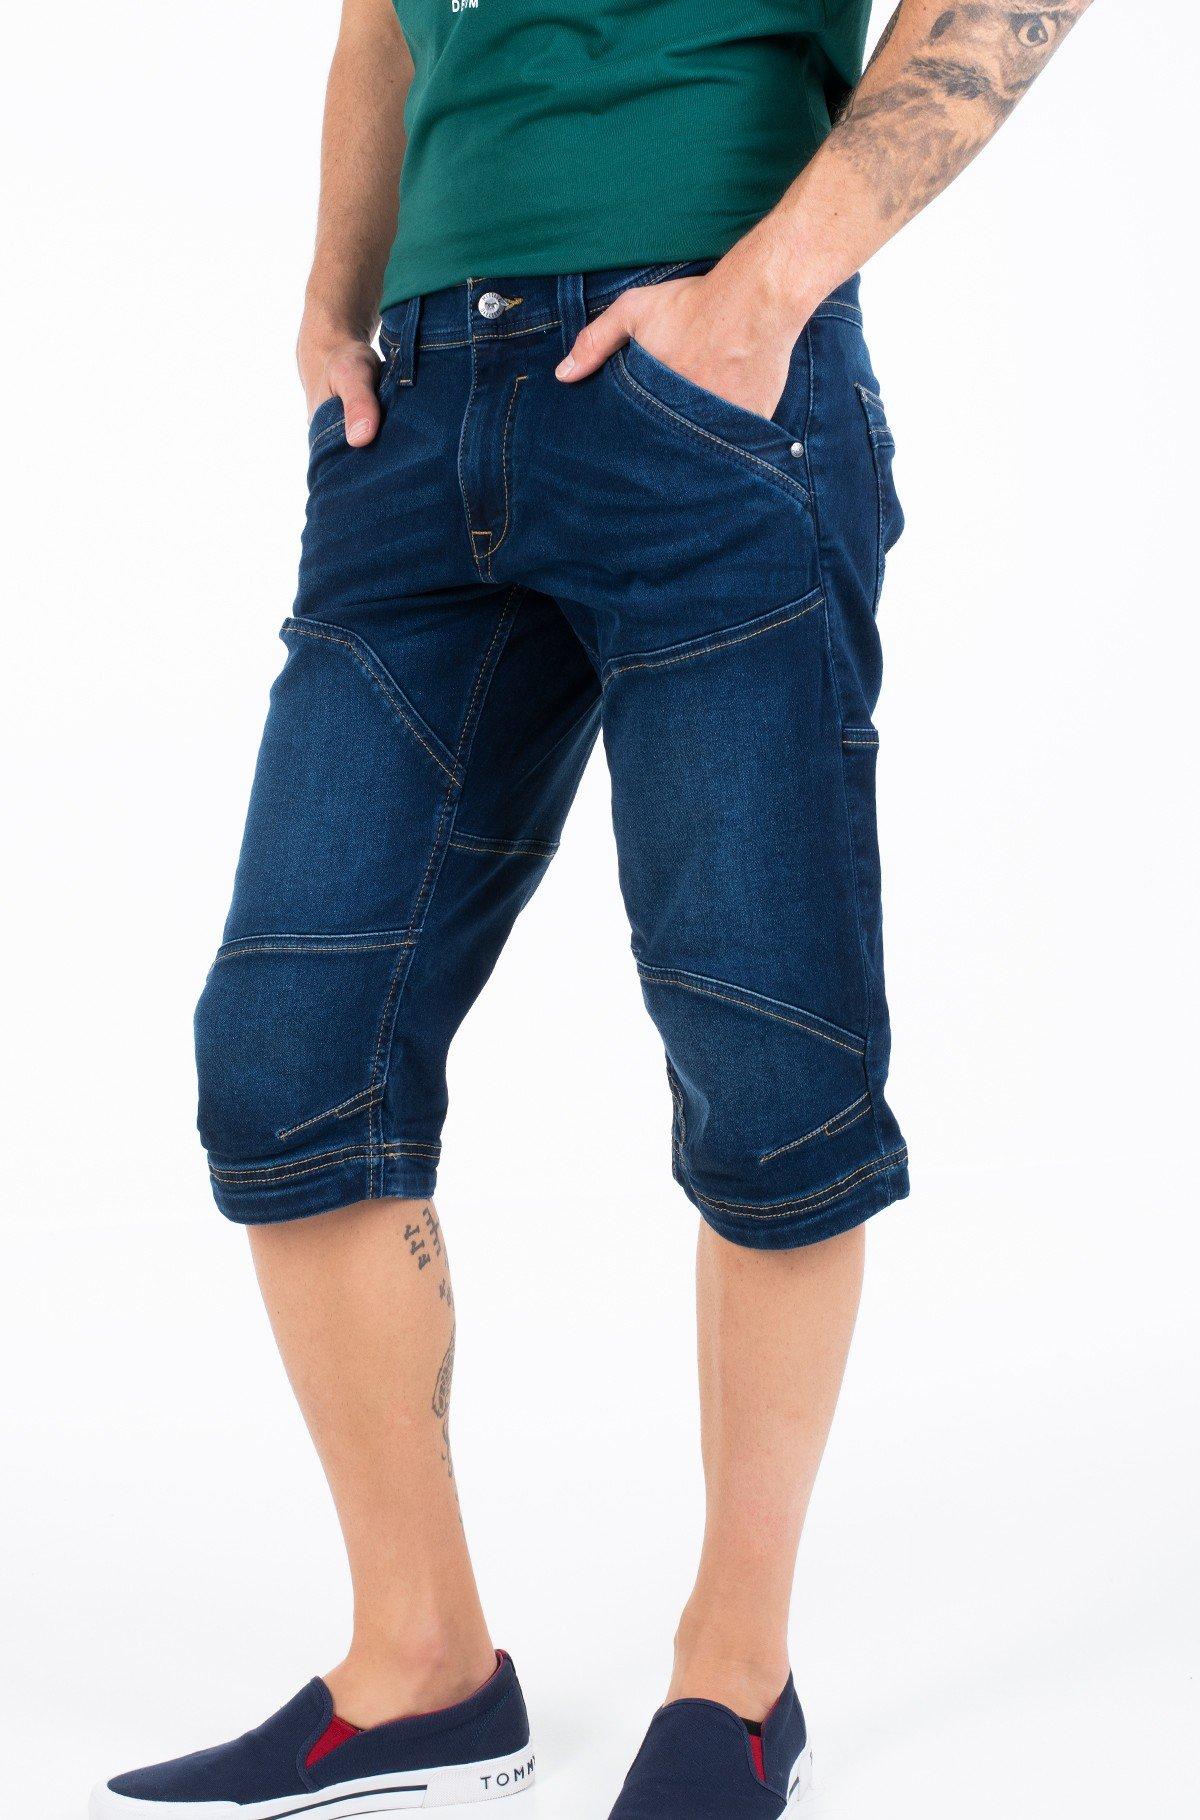 Shorts 1009237-full-1